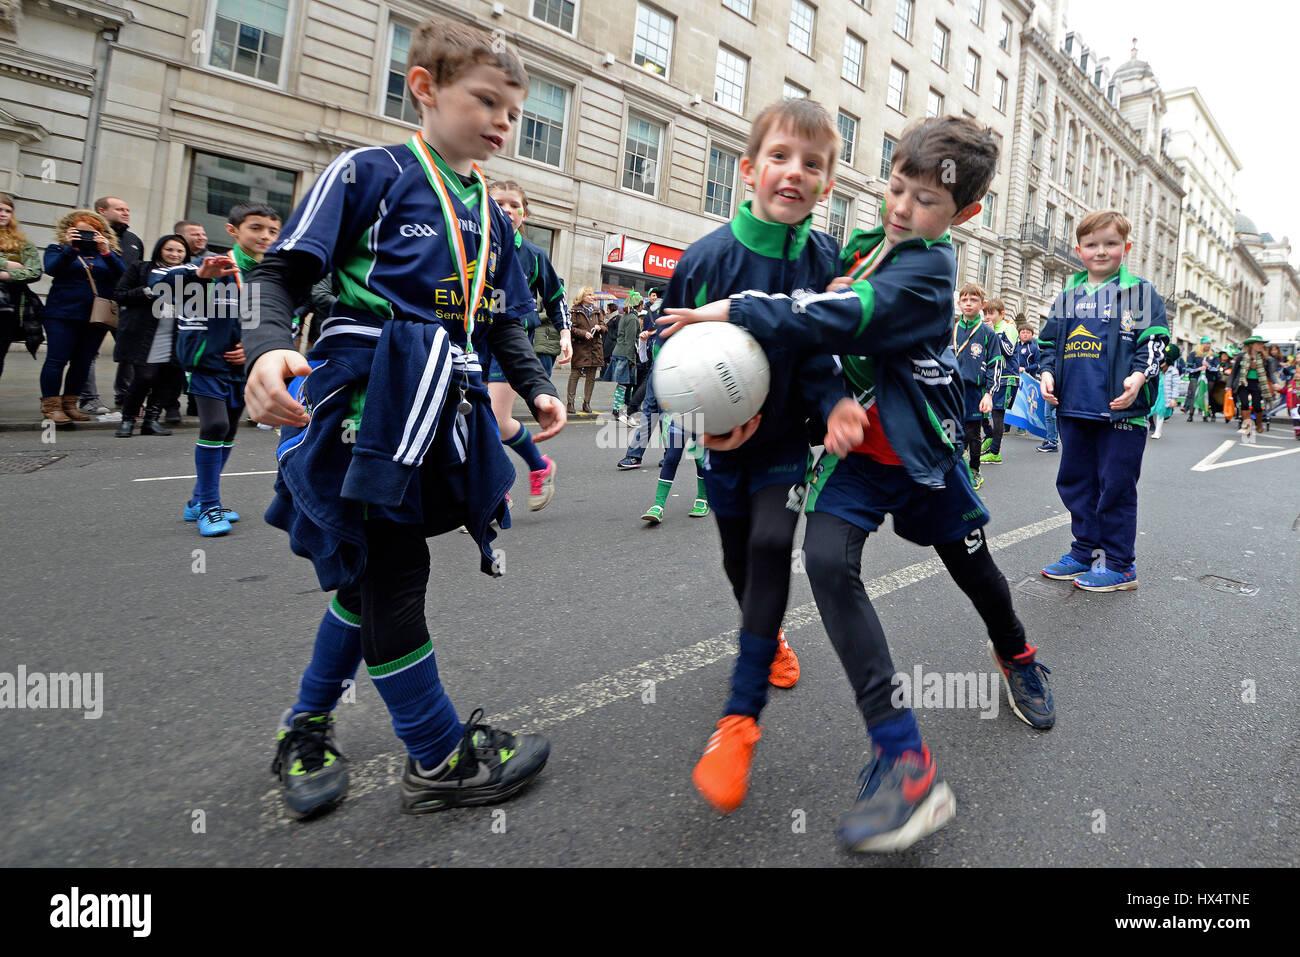 North London Shamrocks Gaelic Football Club boys playing during the 2017 London St. Patrick's Day Parade Stock Photo